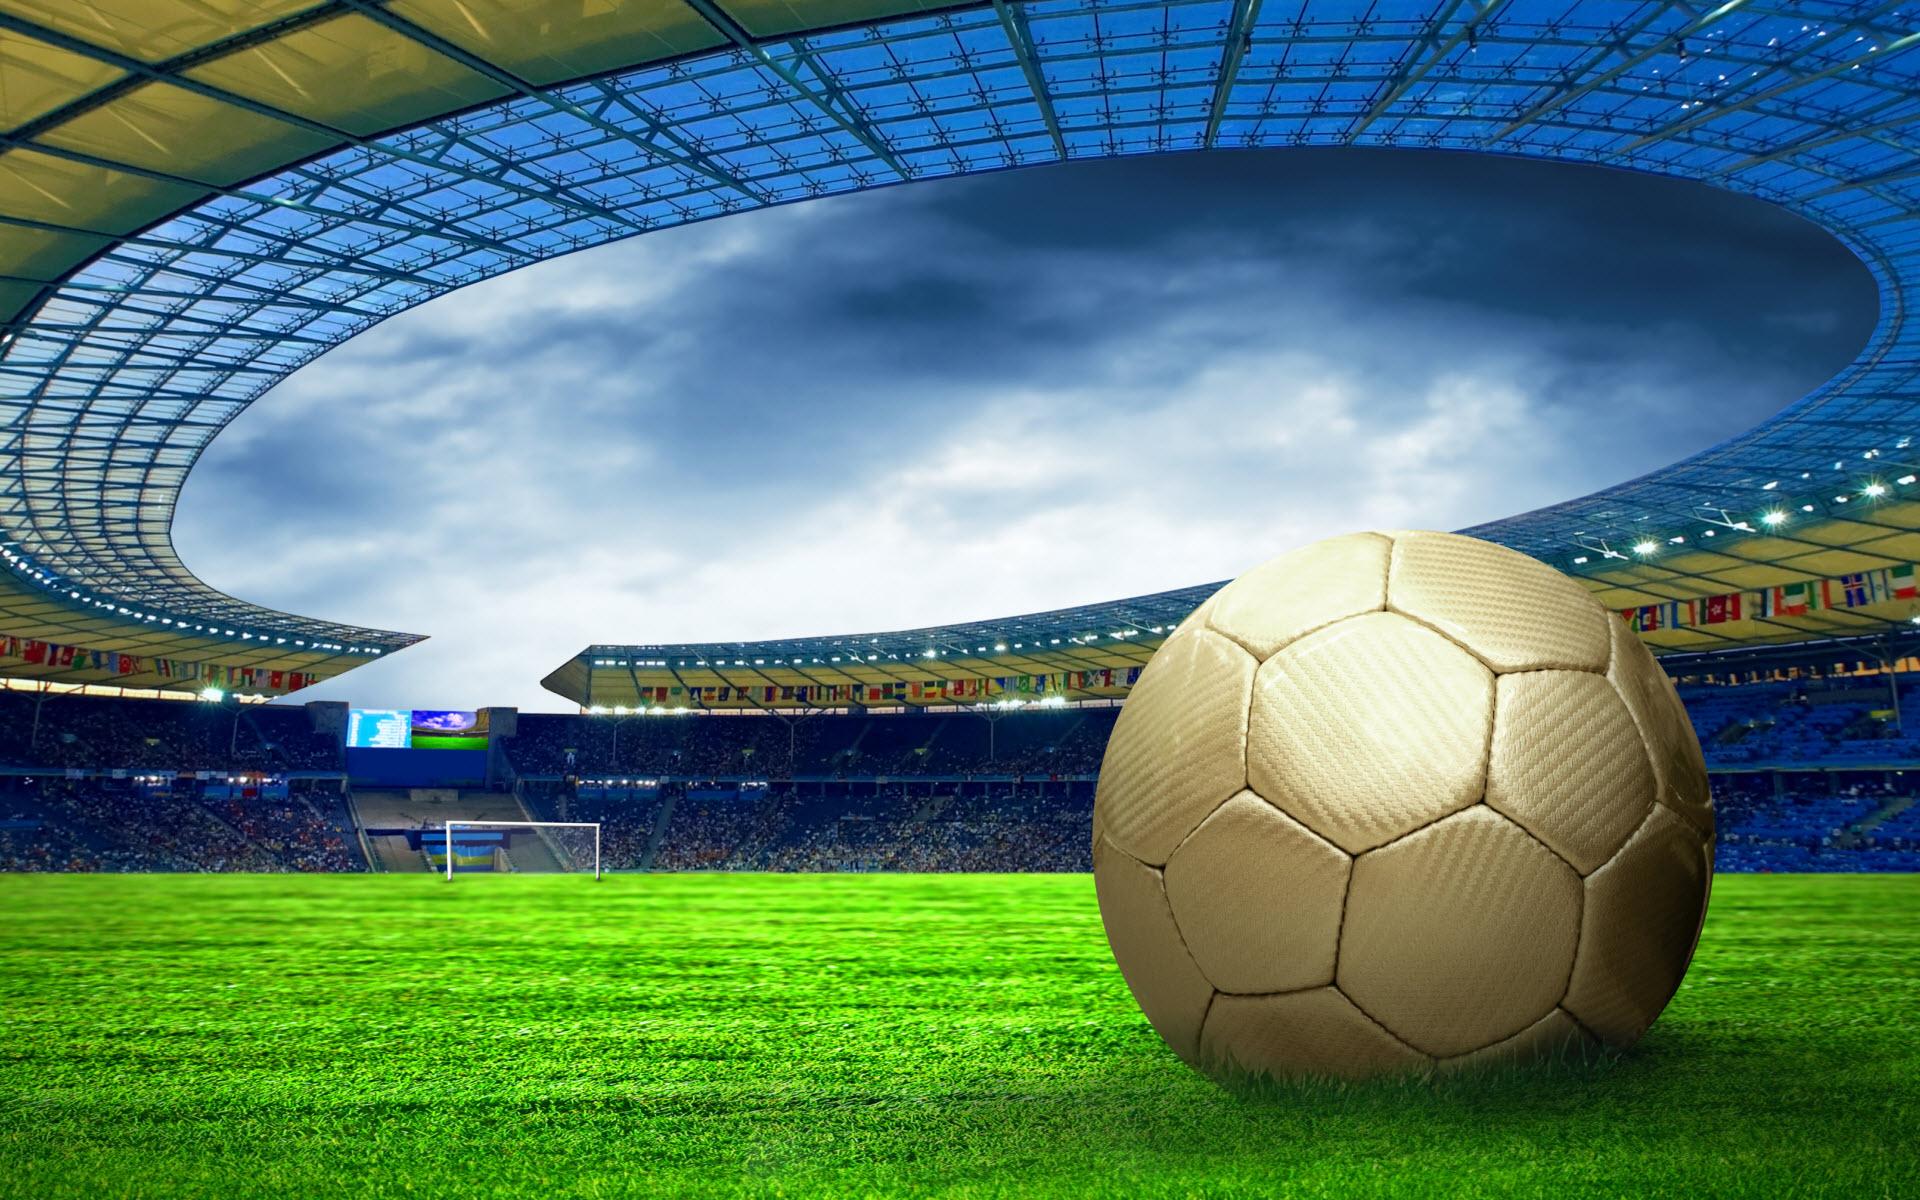 Hd Football Screensavers 19201200 122847 HD Wallpaper Res 1920x1200